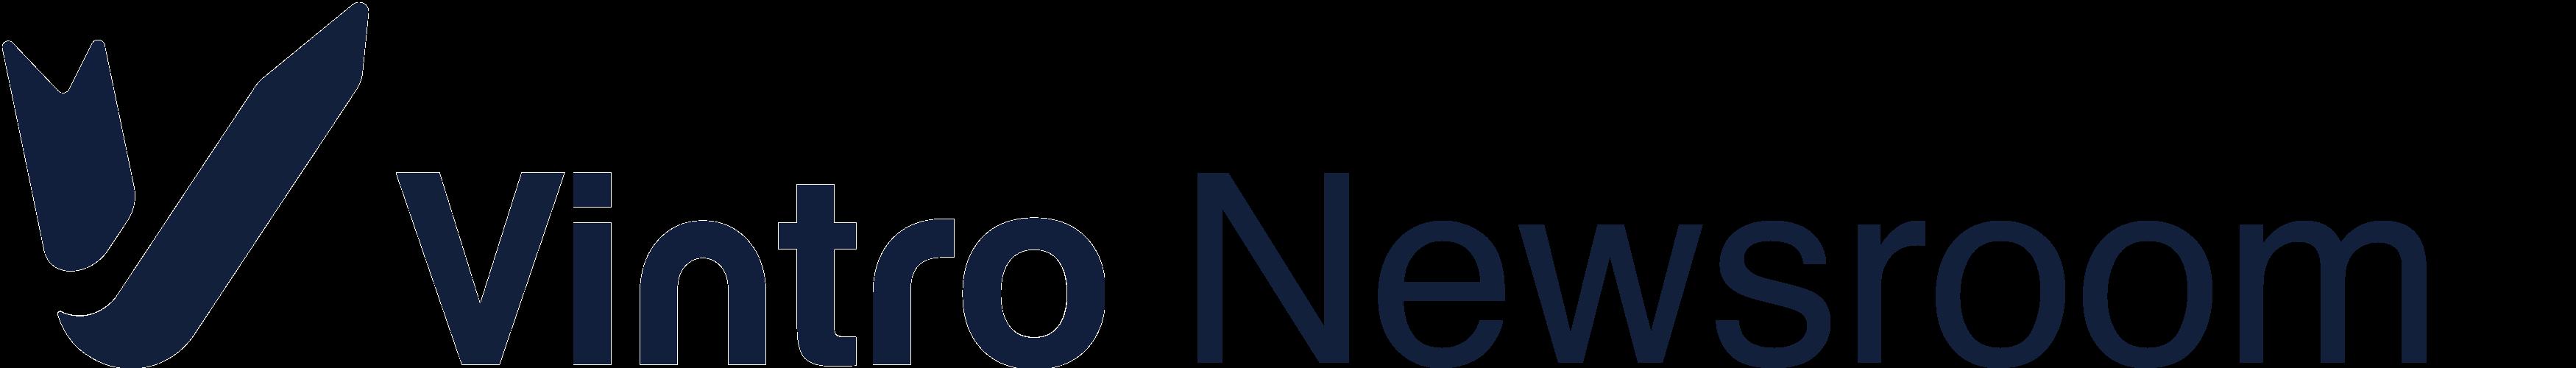 Vintro Newsroom logo